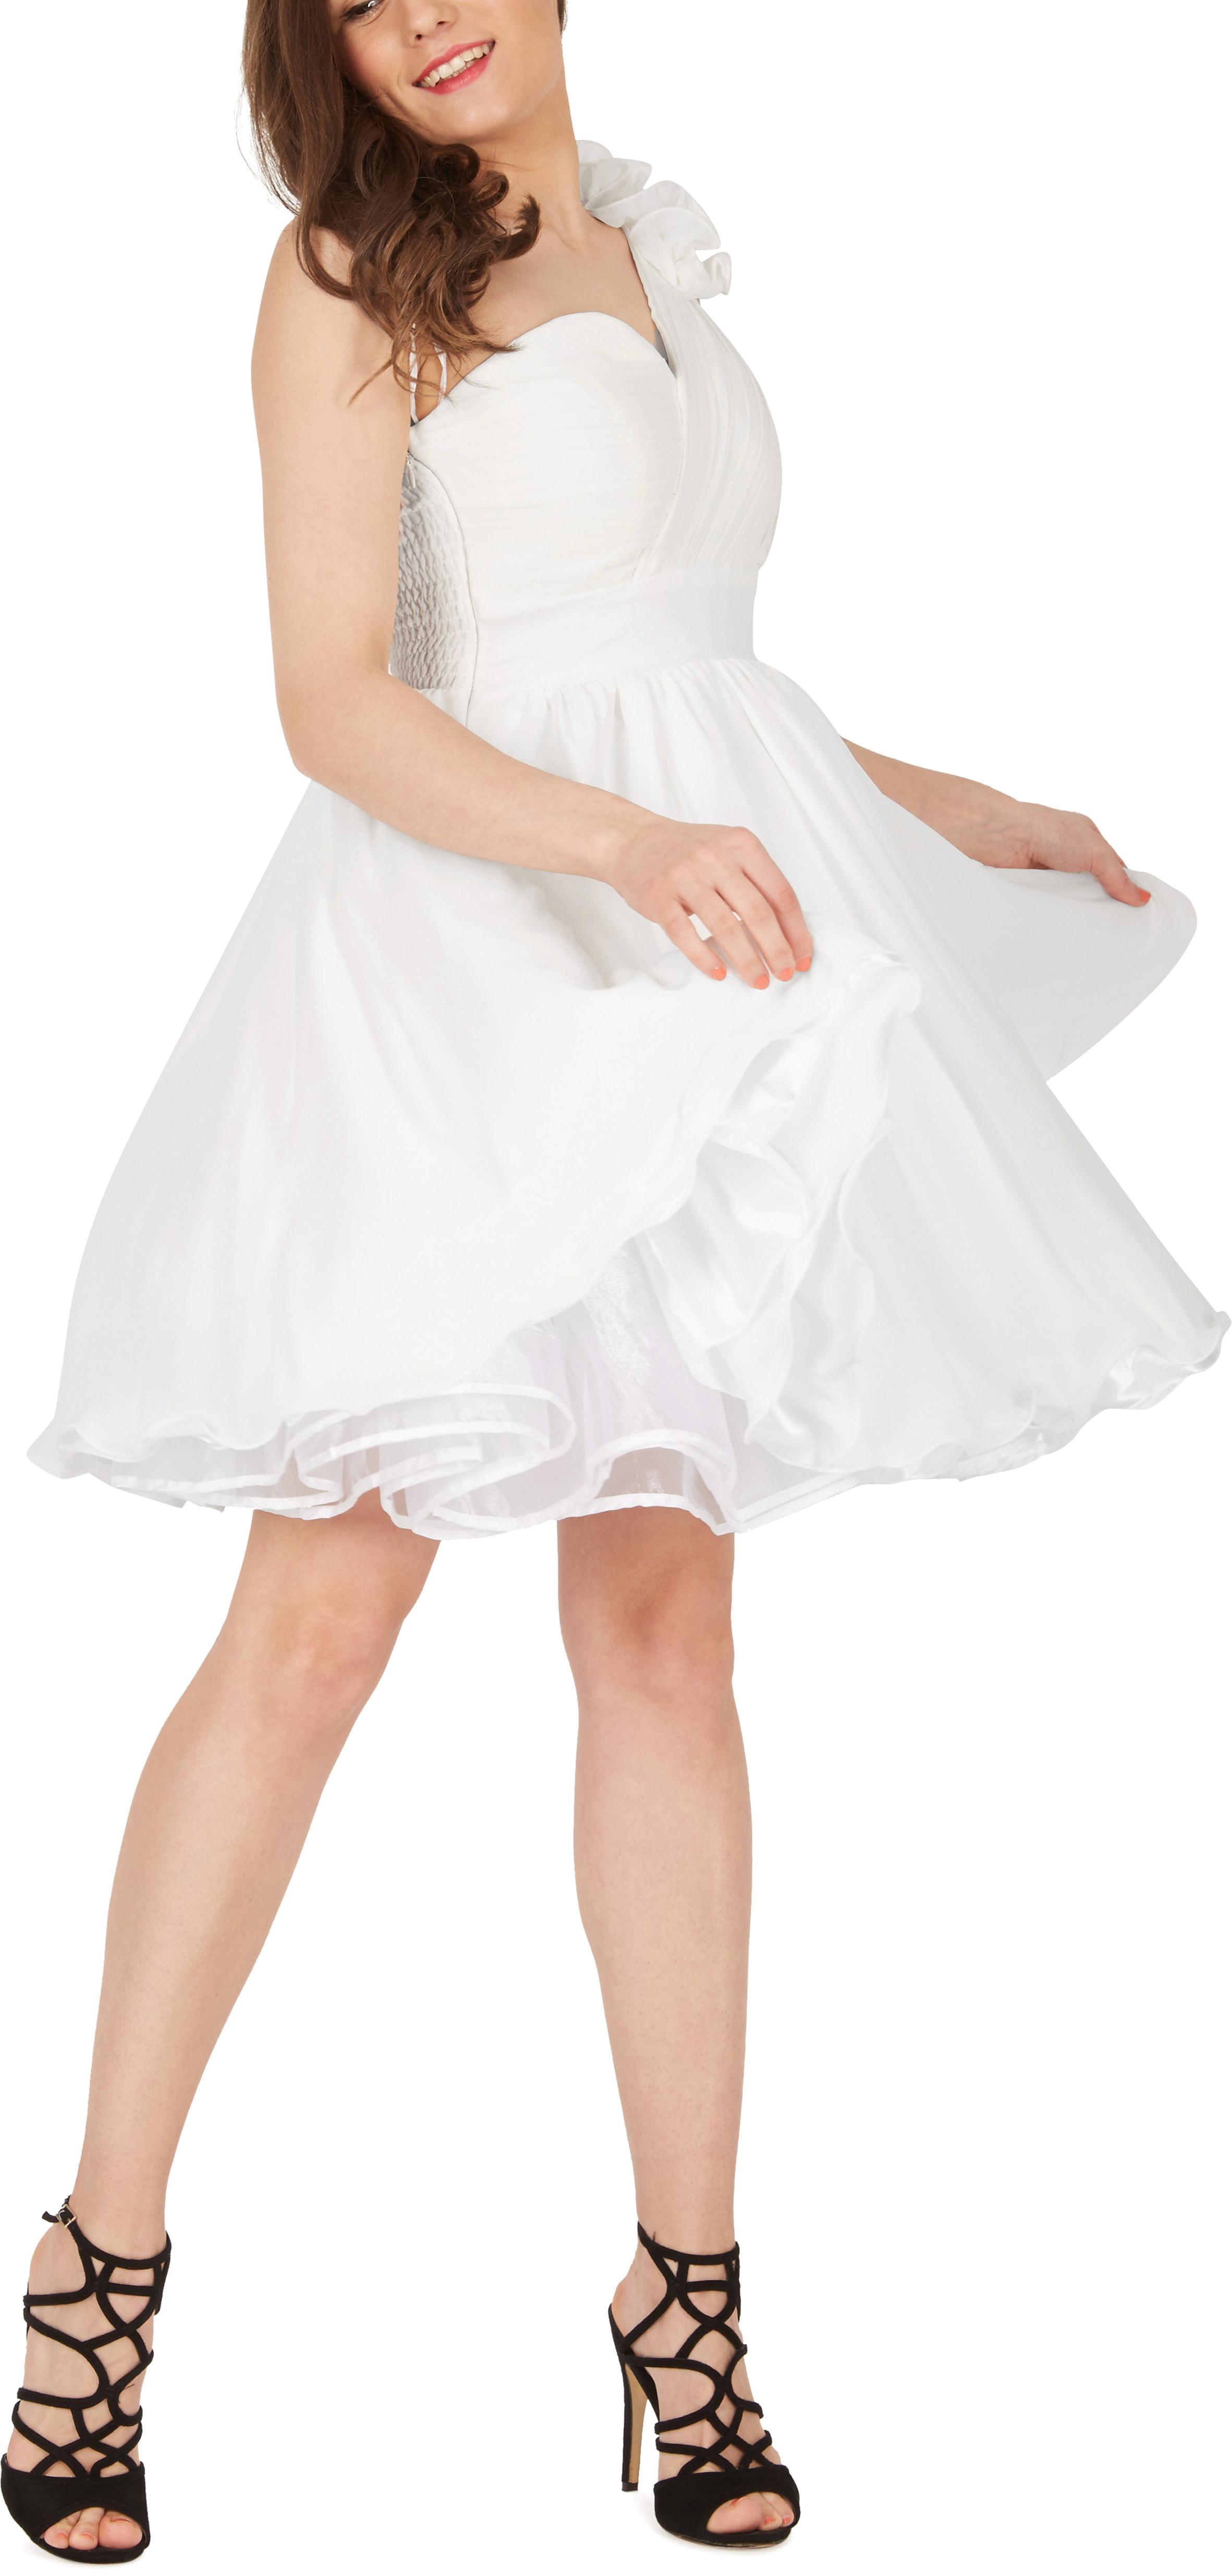 Stunning /'Clarissa/' Vintage Clarity 50/'s Wedding Bridesmaids Cocktail Prom Dress